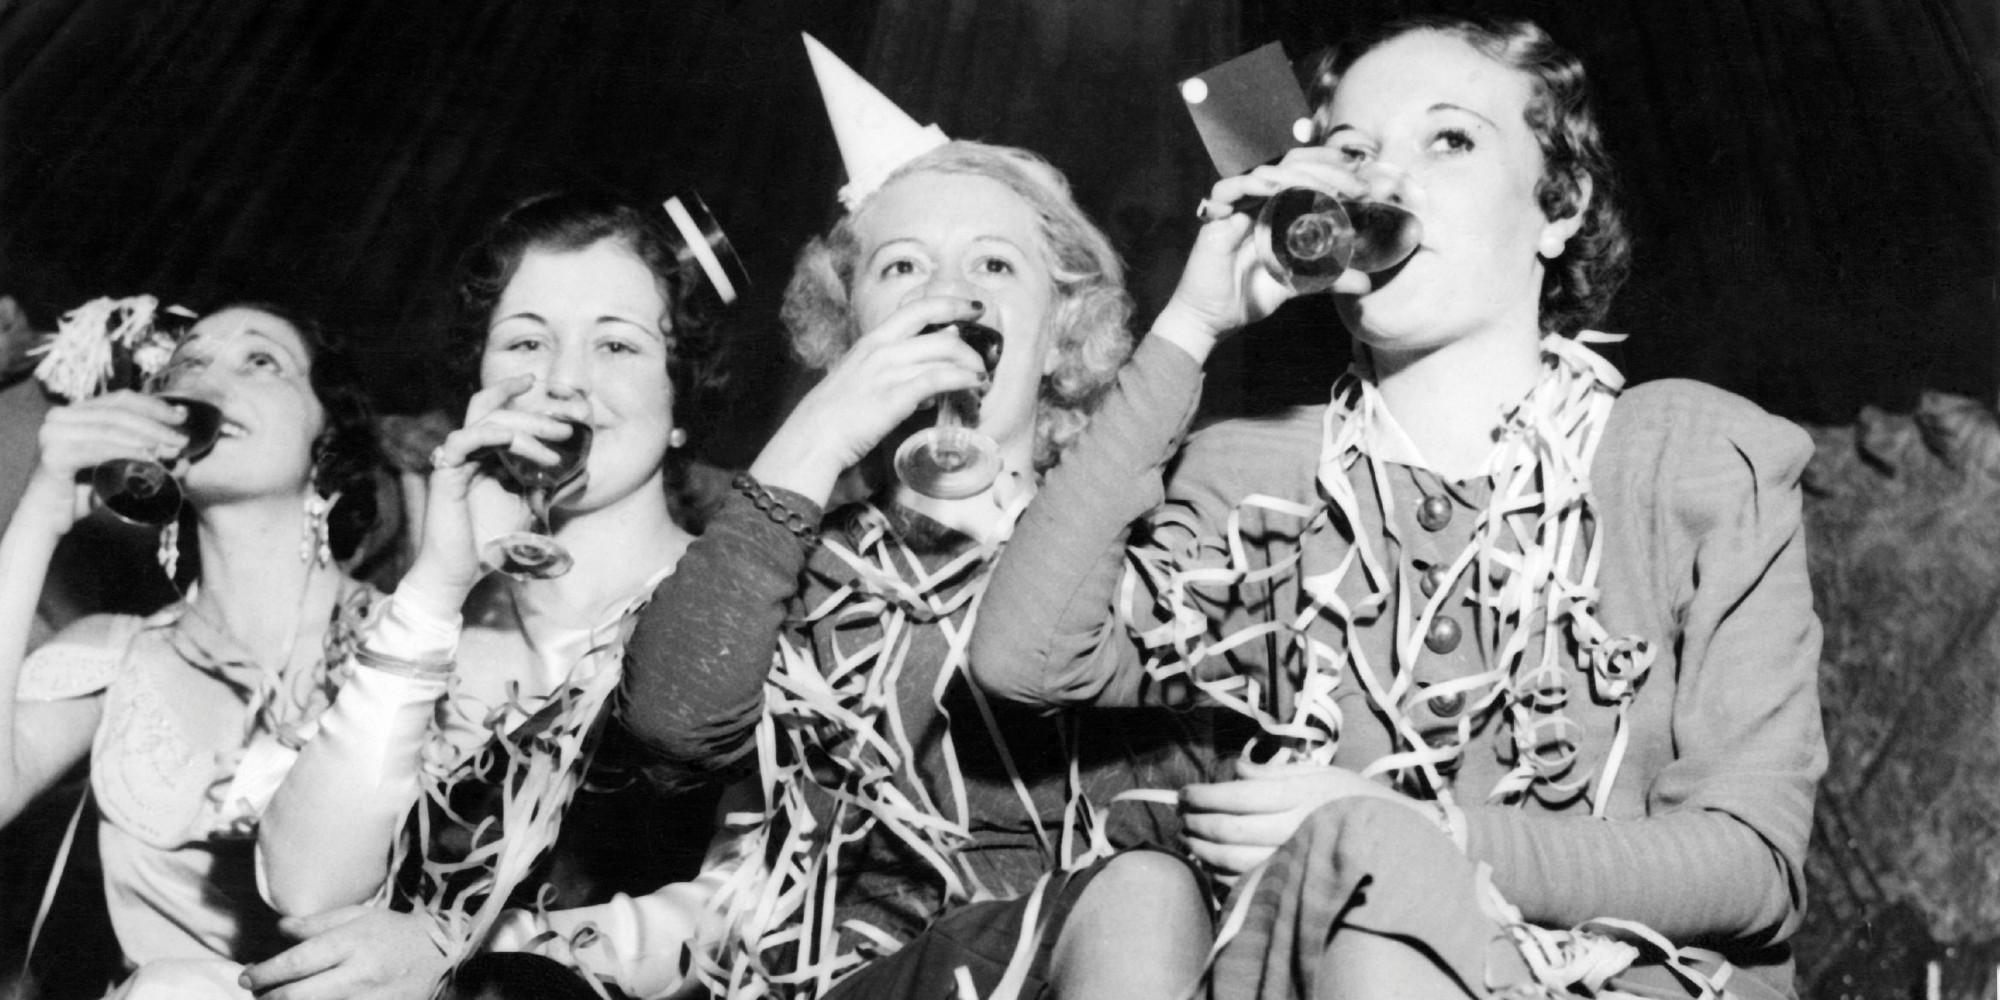 A celebration gone wrong - 1 10